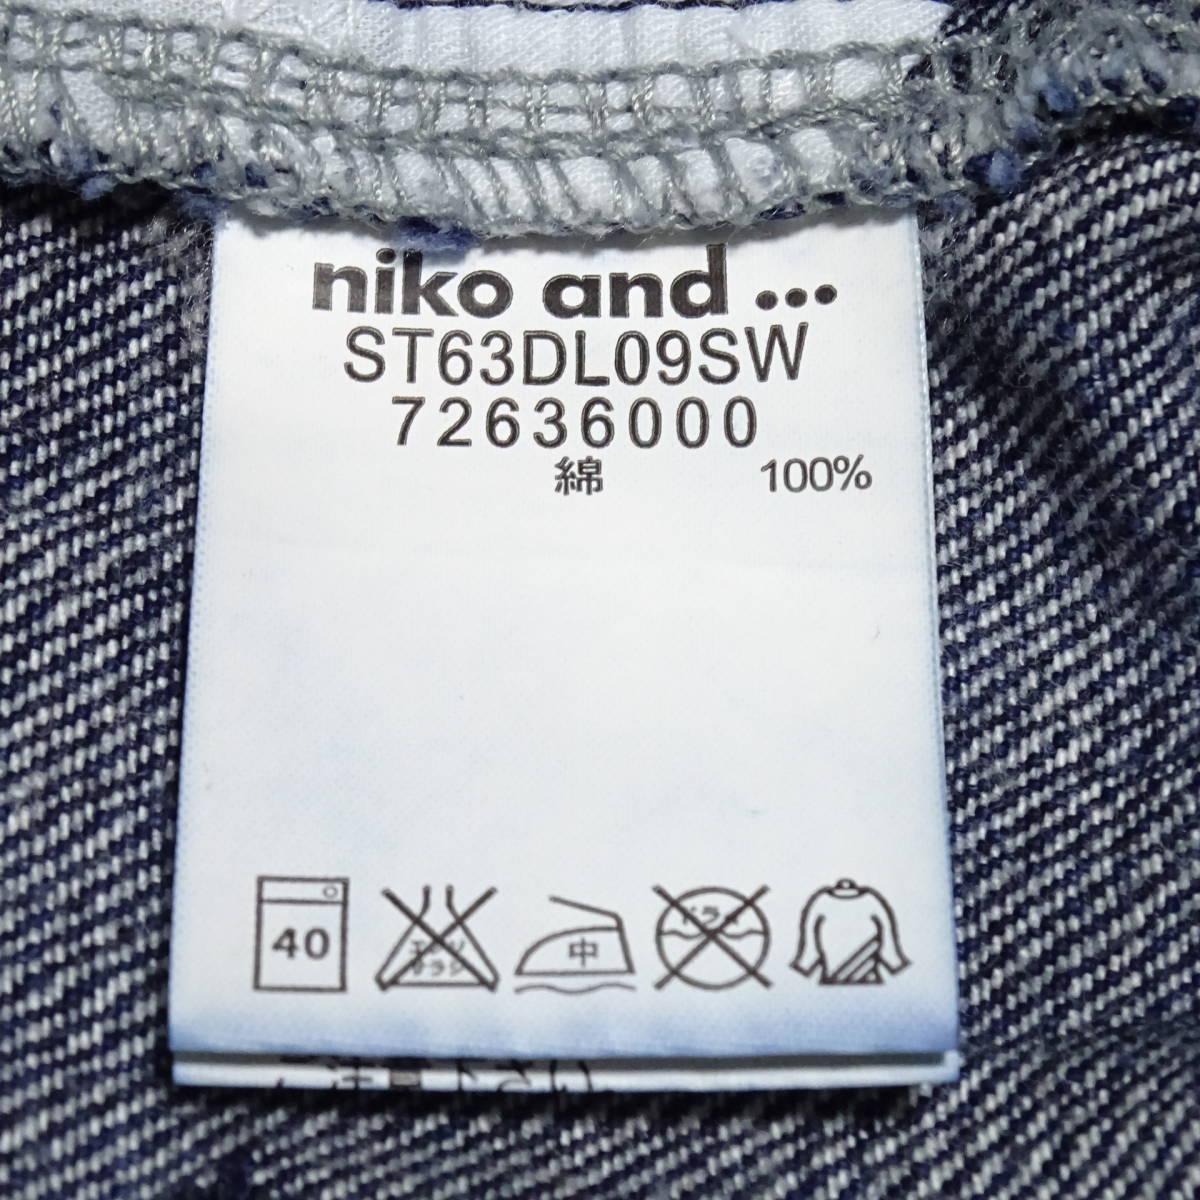 niko and ... ニコアンド デニム ワイドパンツ ストレート Lサイズ 濃紺 ウエスト約74cm 宅急便コンパクト 送料無料 匿名配送